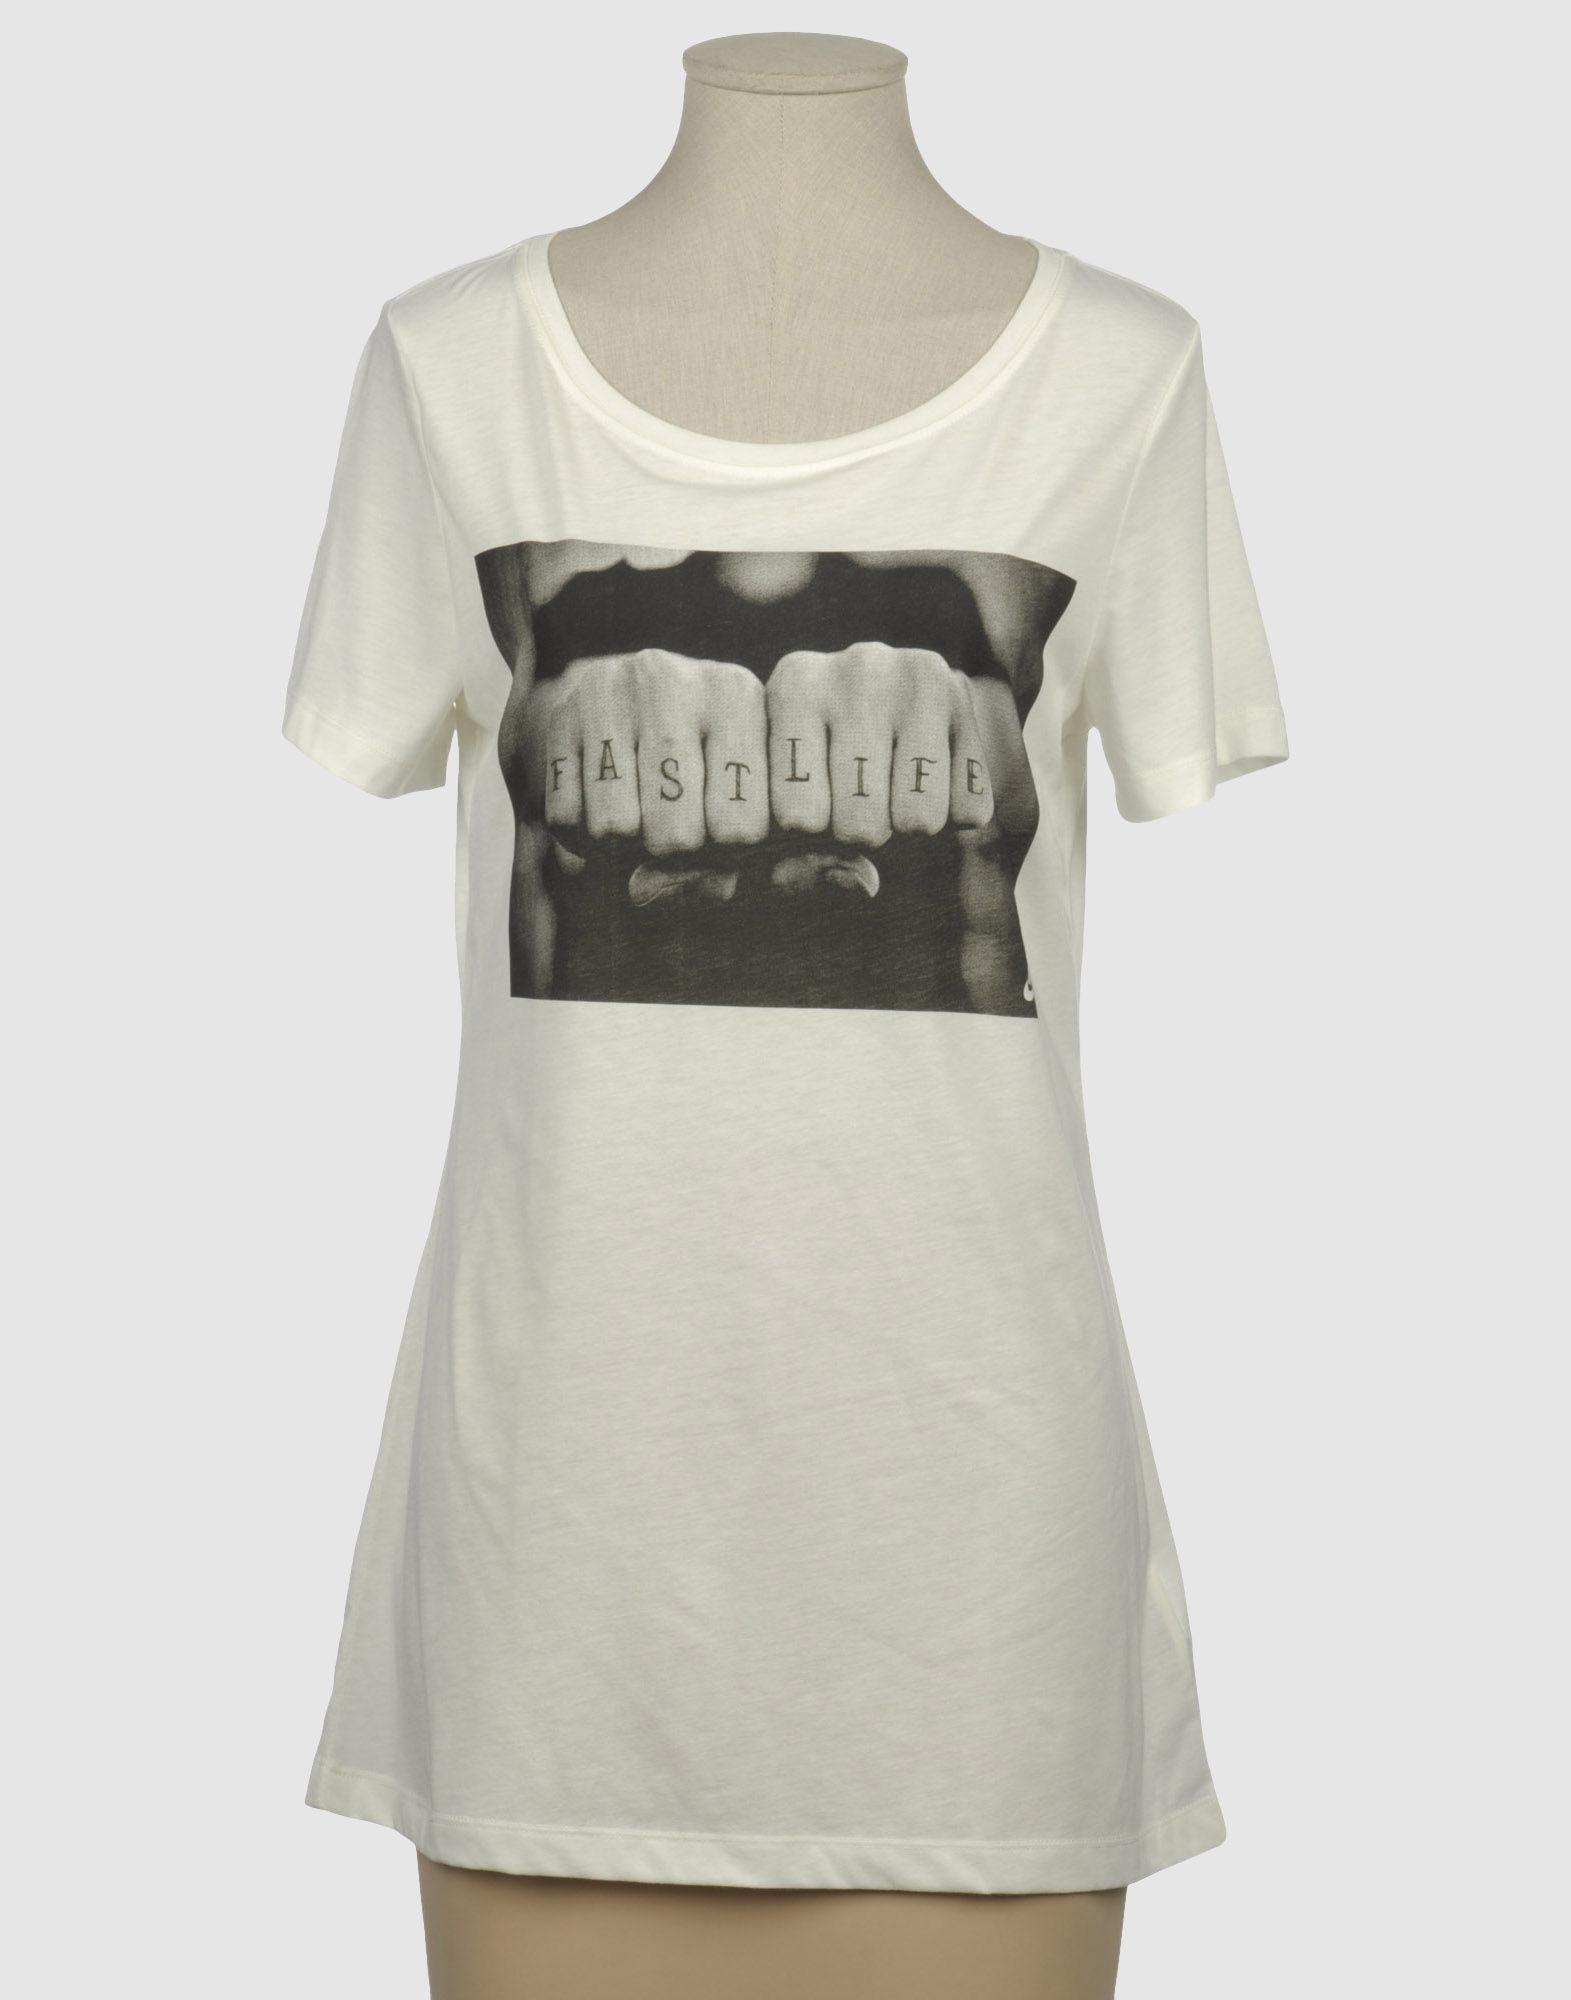 Nike short sleeve t shirt in white ivory save 4 lyst for Nike short sleeve shirt